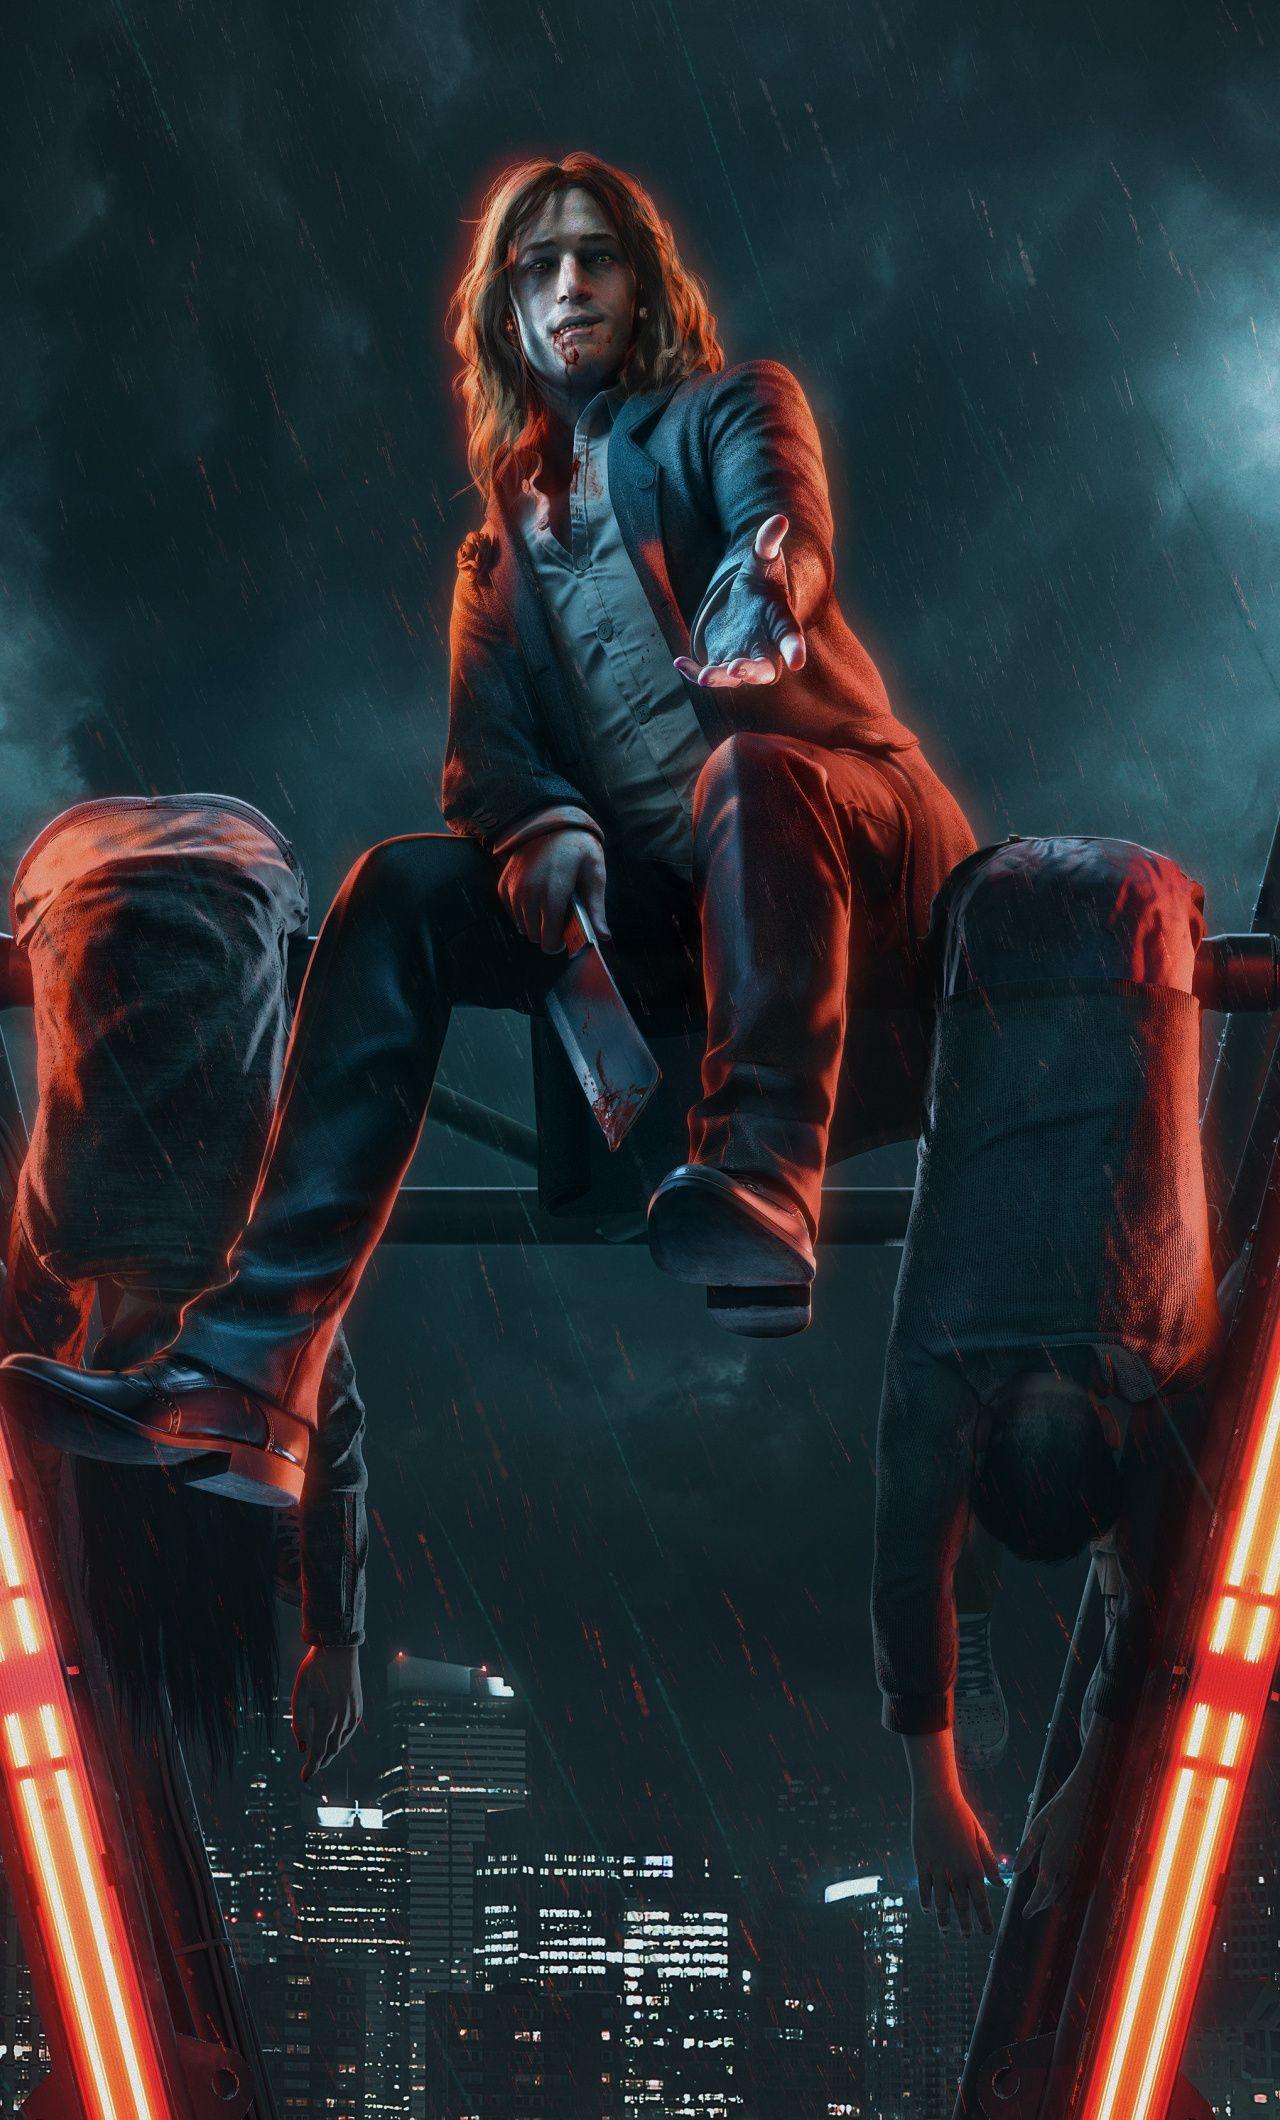 1280x2120 Vampire The Masquerade Bloodlines 2 2020 Game